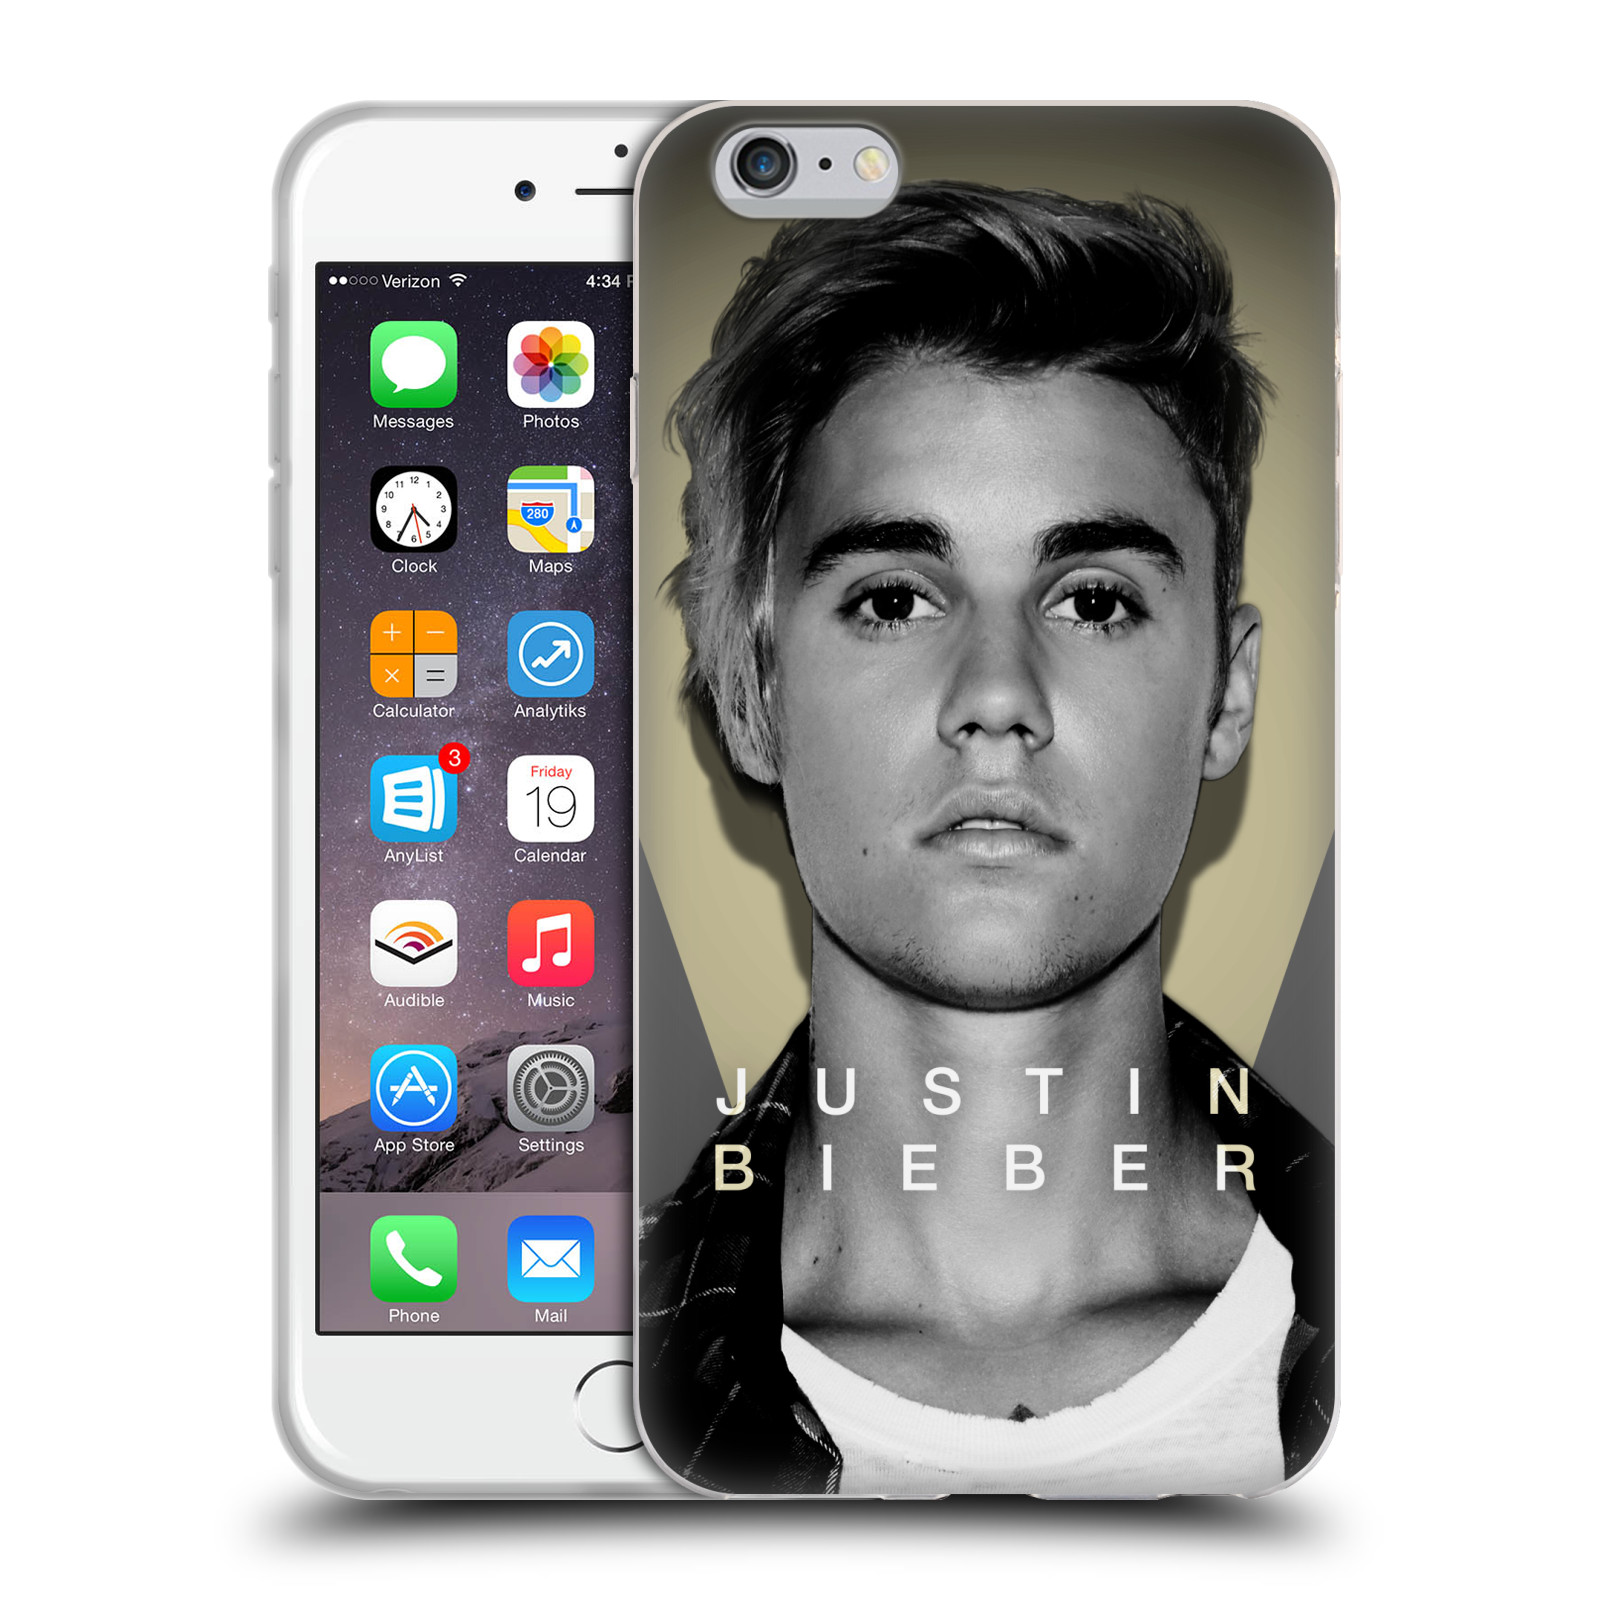 HEAD CASE silikonový obal na mobil Apple Iphone 6 PLUS / 6S PLUS originální potisk Justin Bieber foto portrét